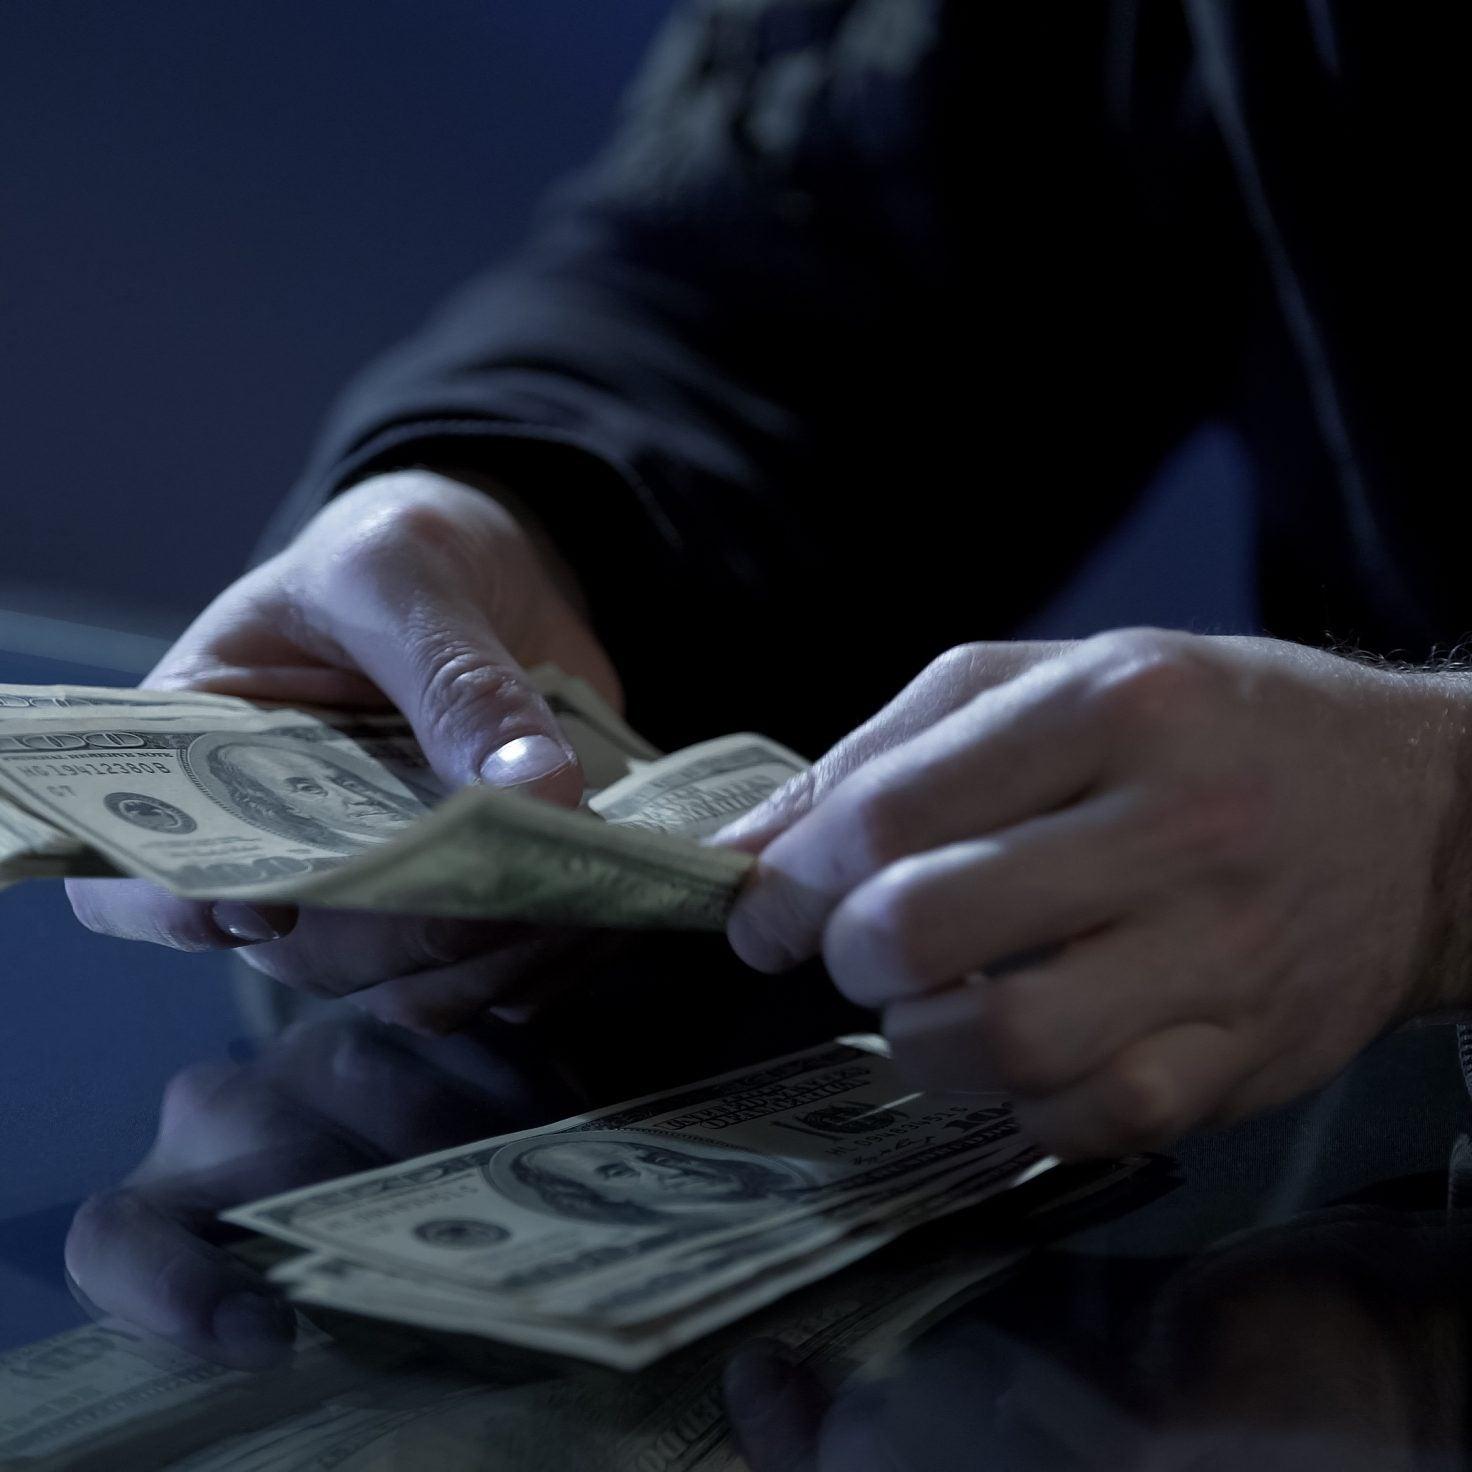 Former Welfare Director Arrested In Huge Embezzlement Scheme